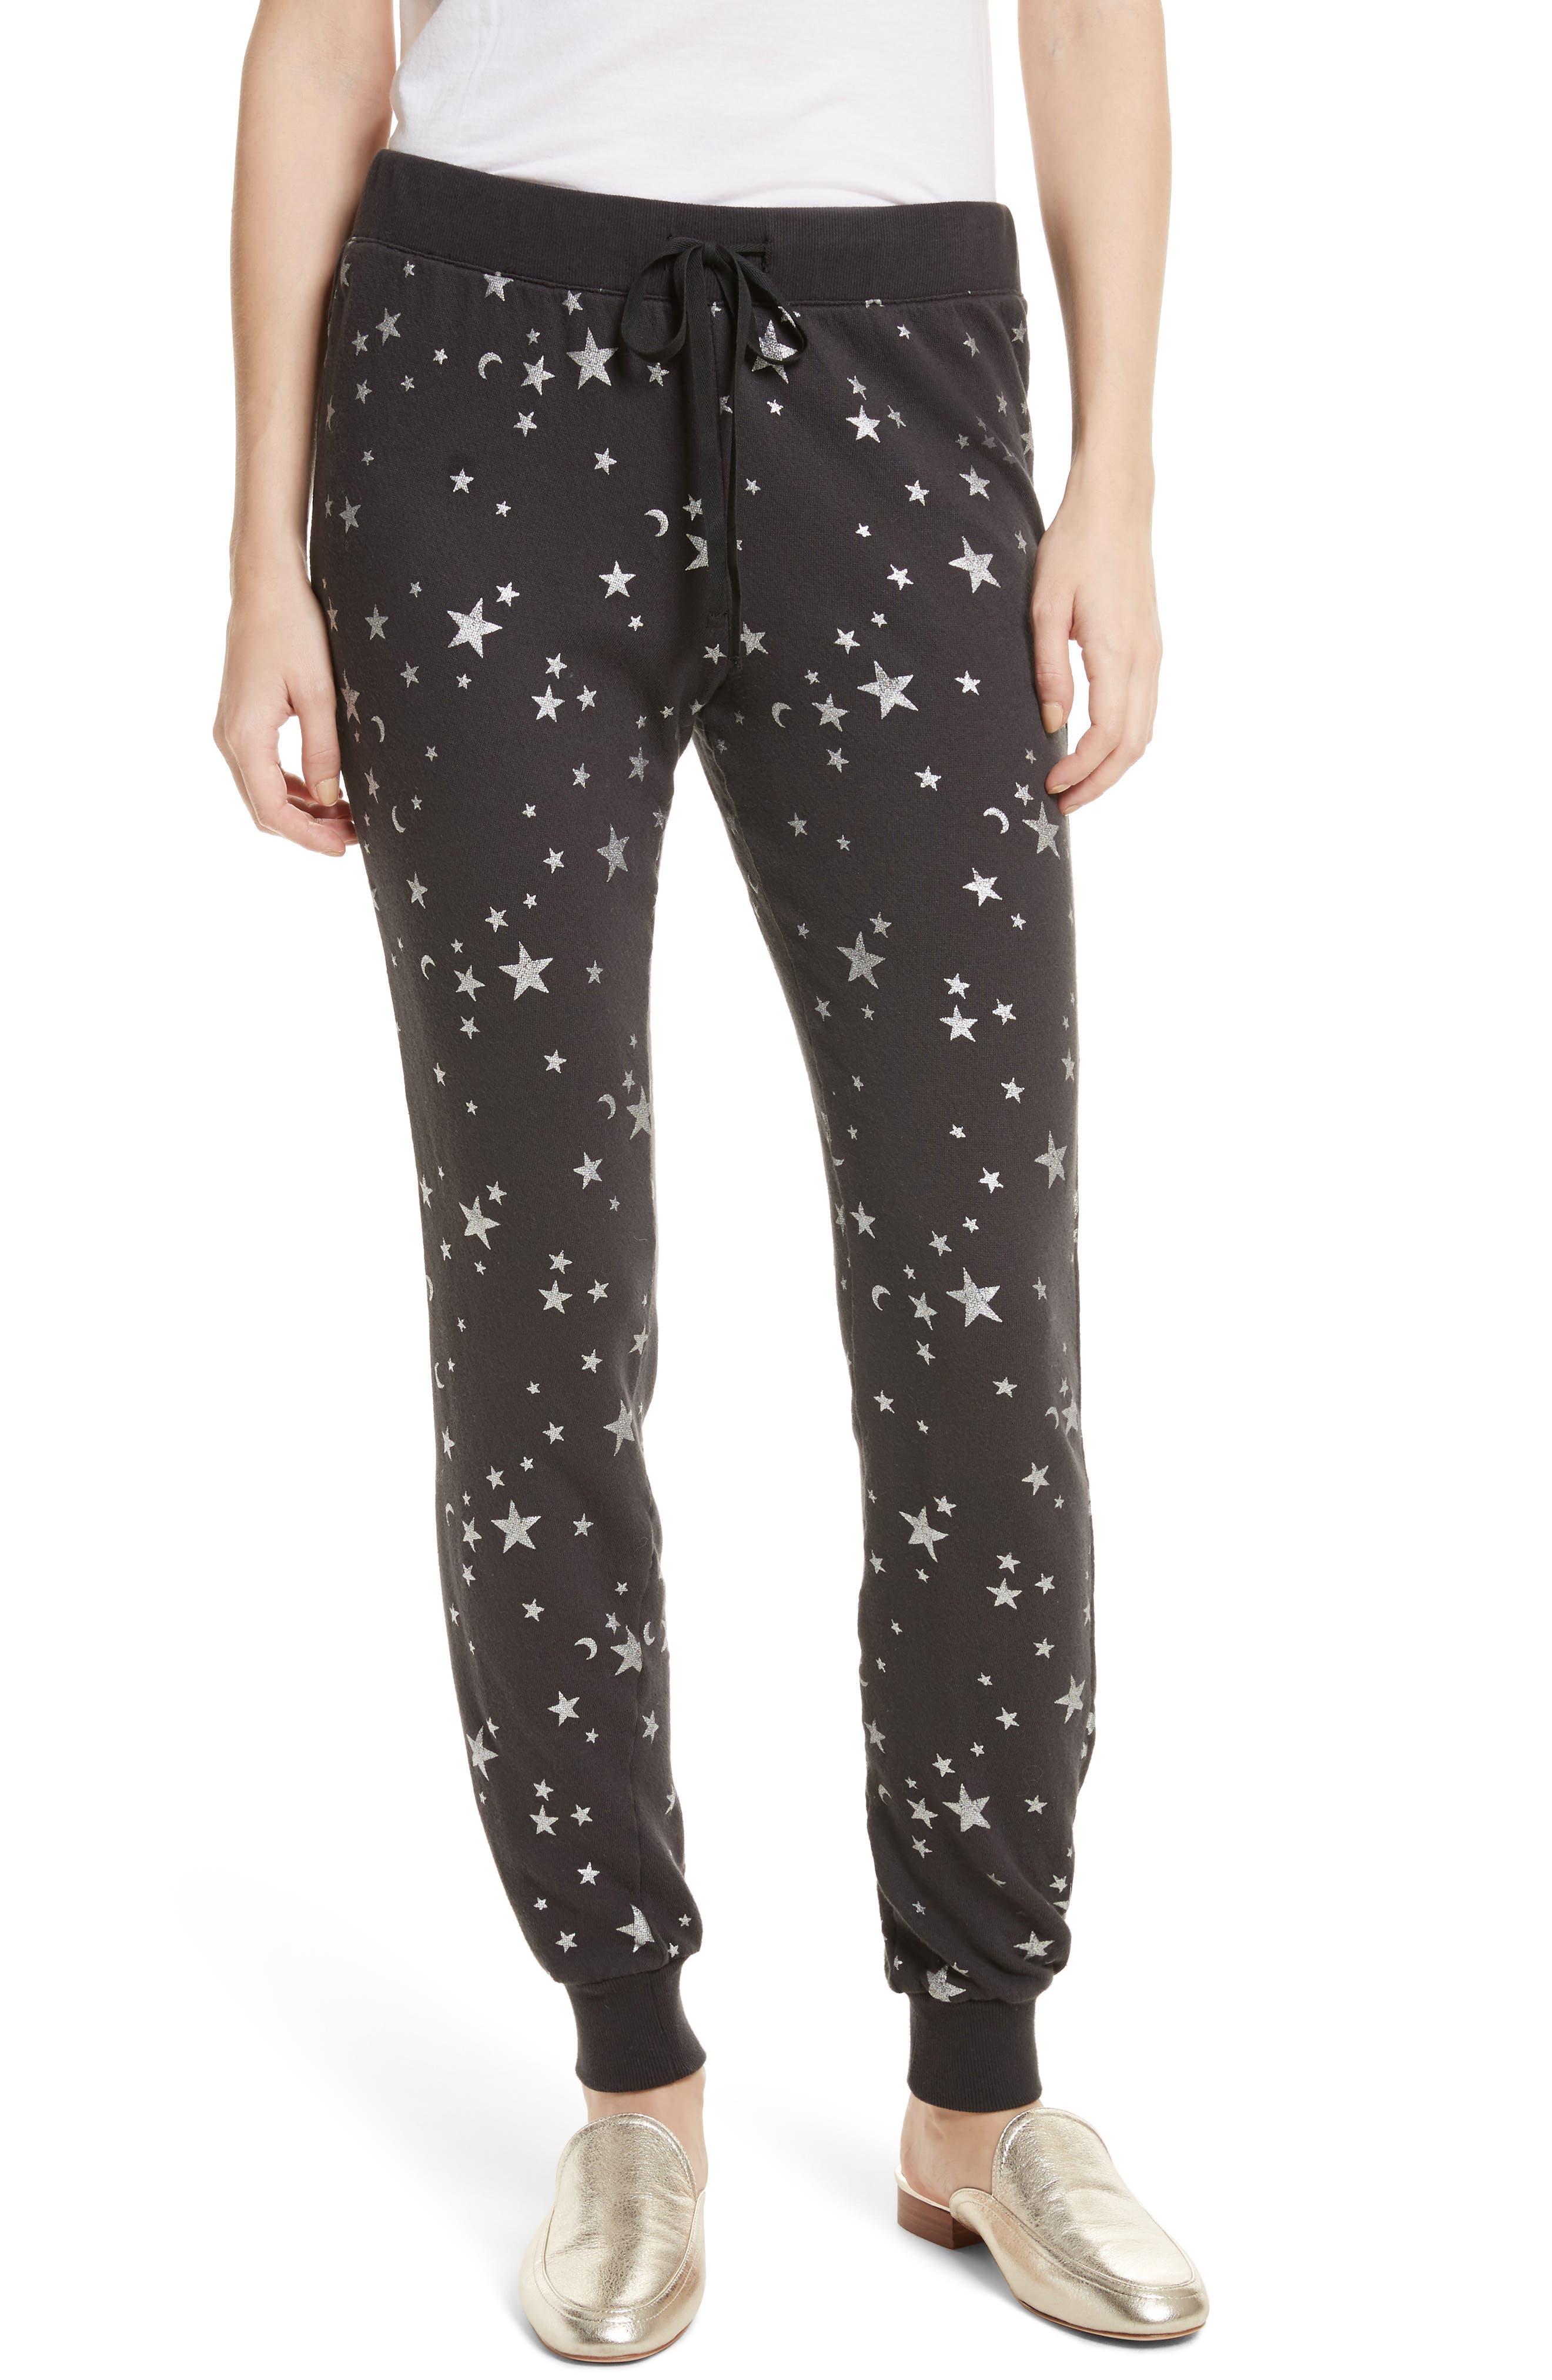 Tendra B Metallic Sweatpants,                             Main thumbnail 1, color,                             Silver Foil/ Caviar